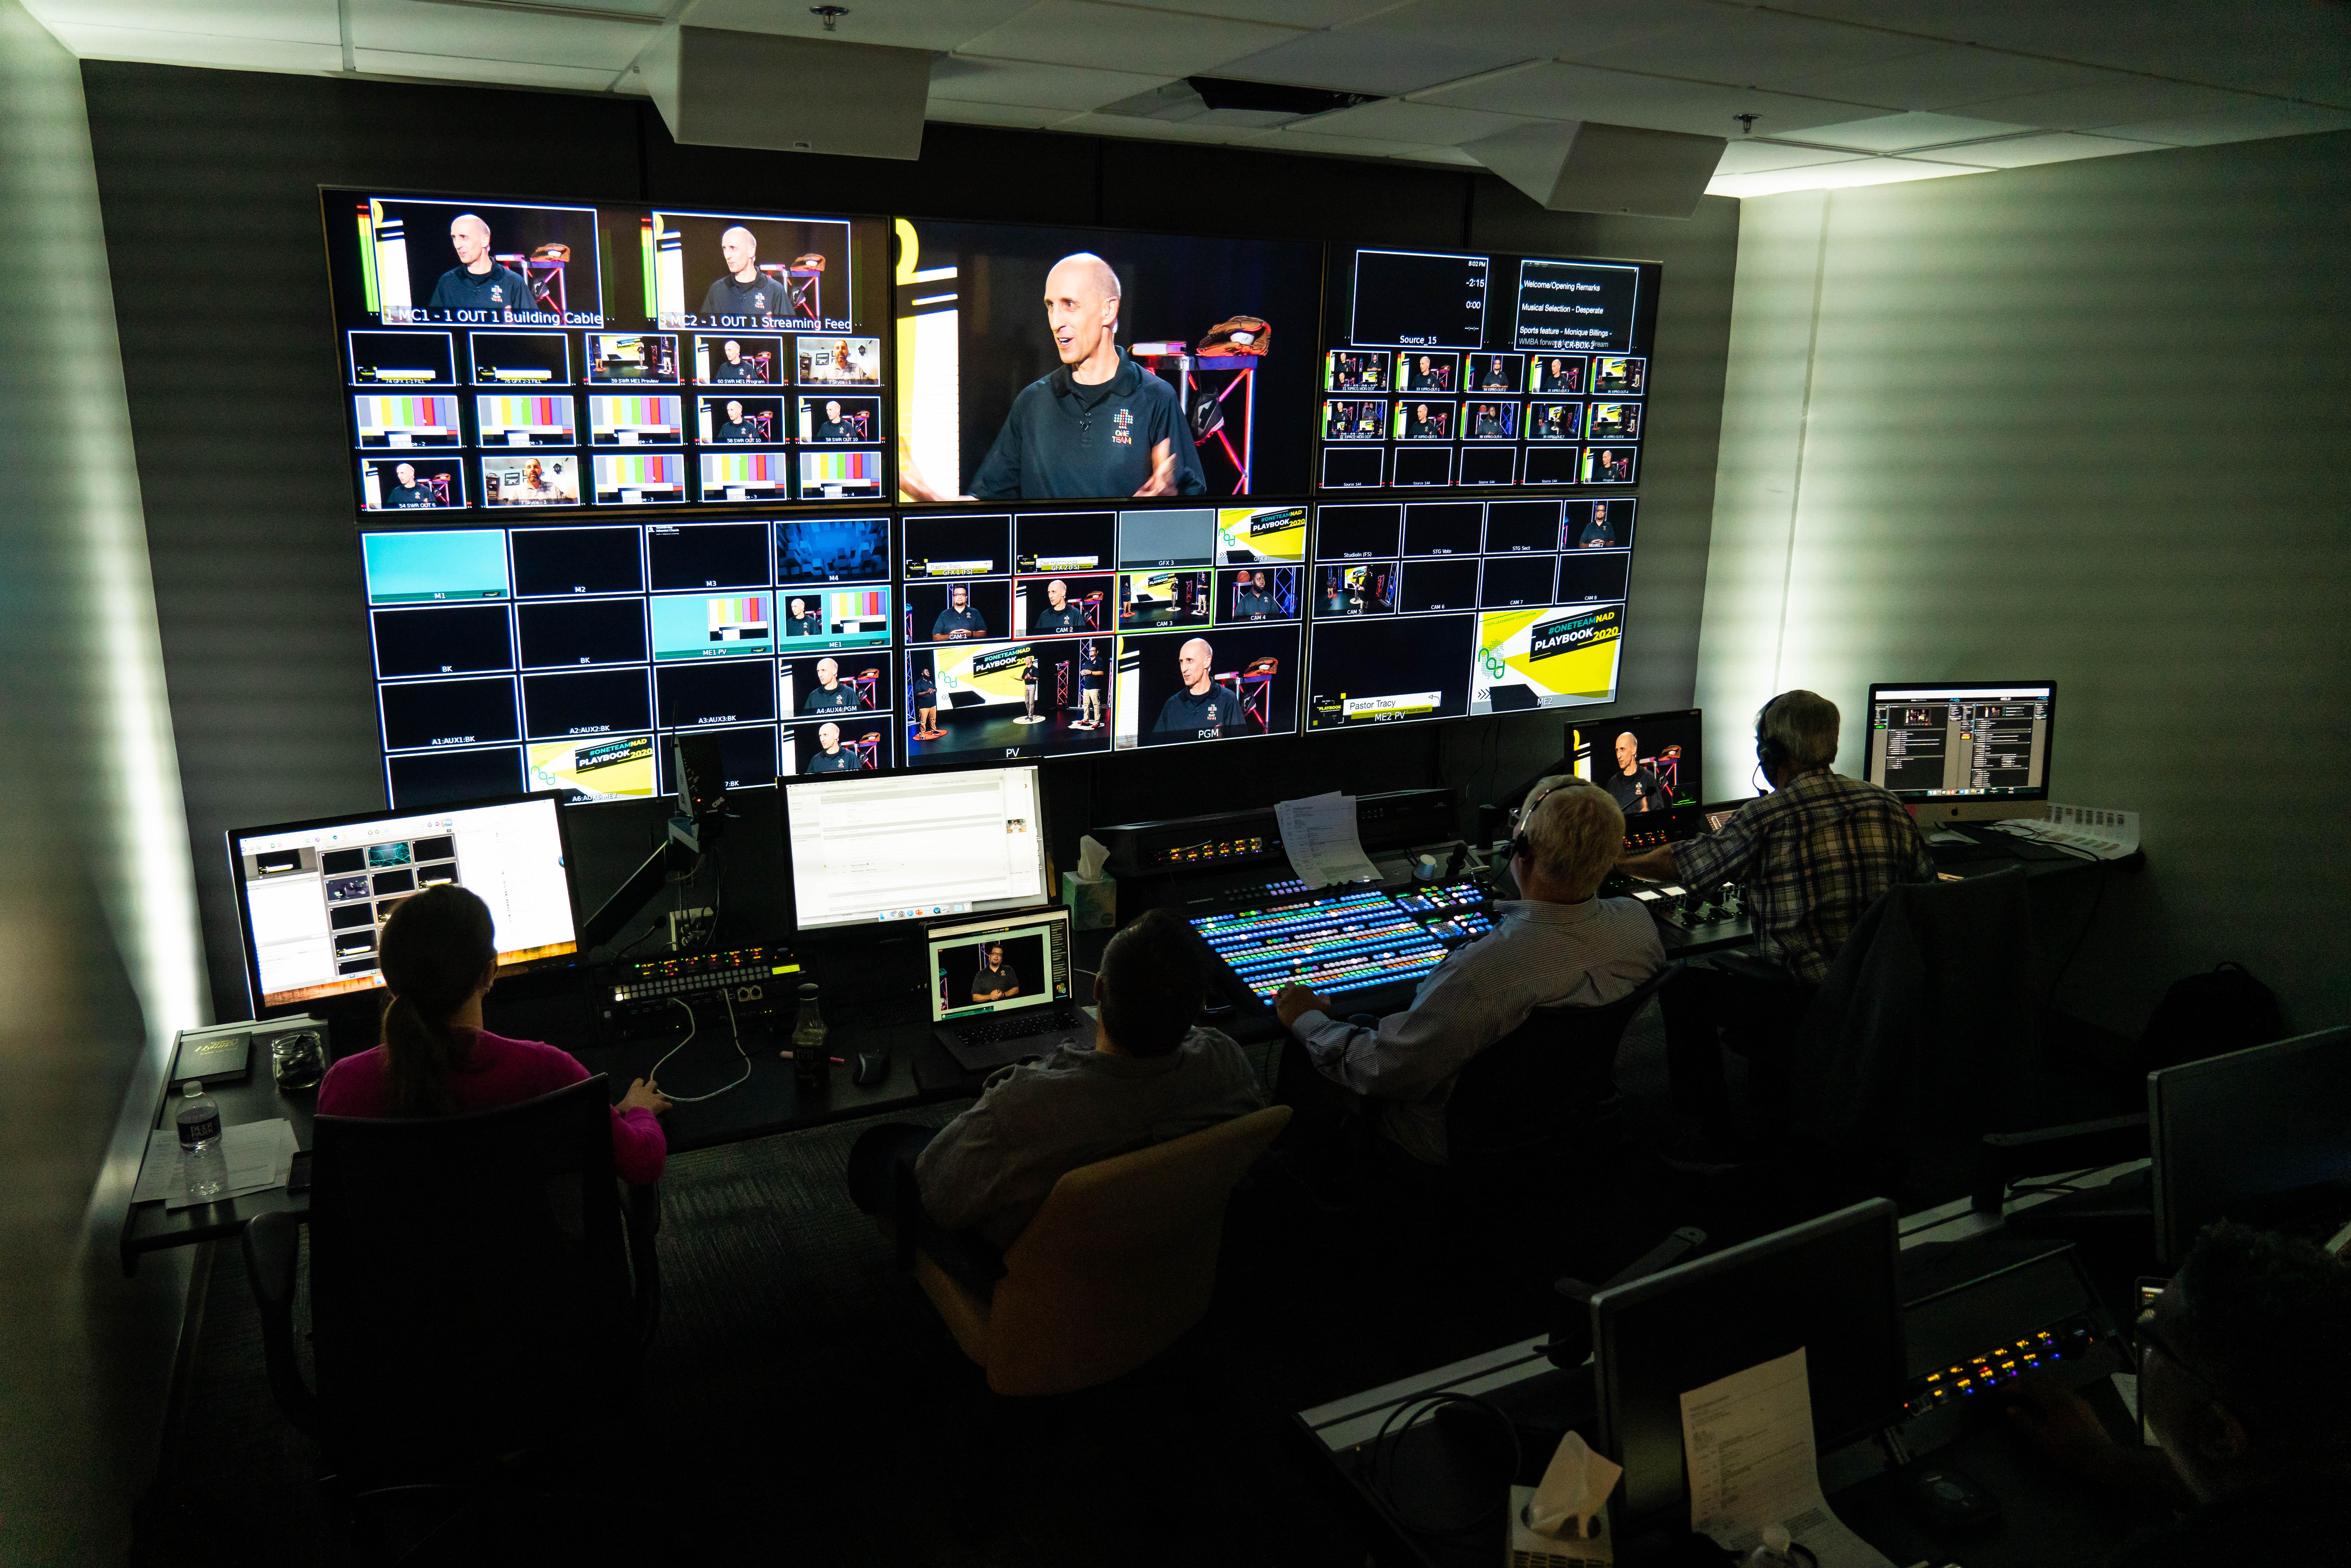 behind the scenes at NAD OneTeam PlayBook 2020